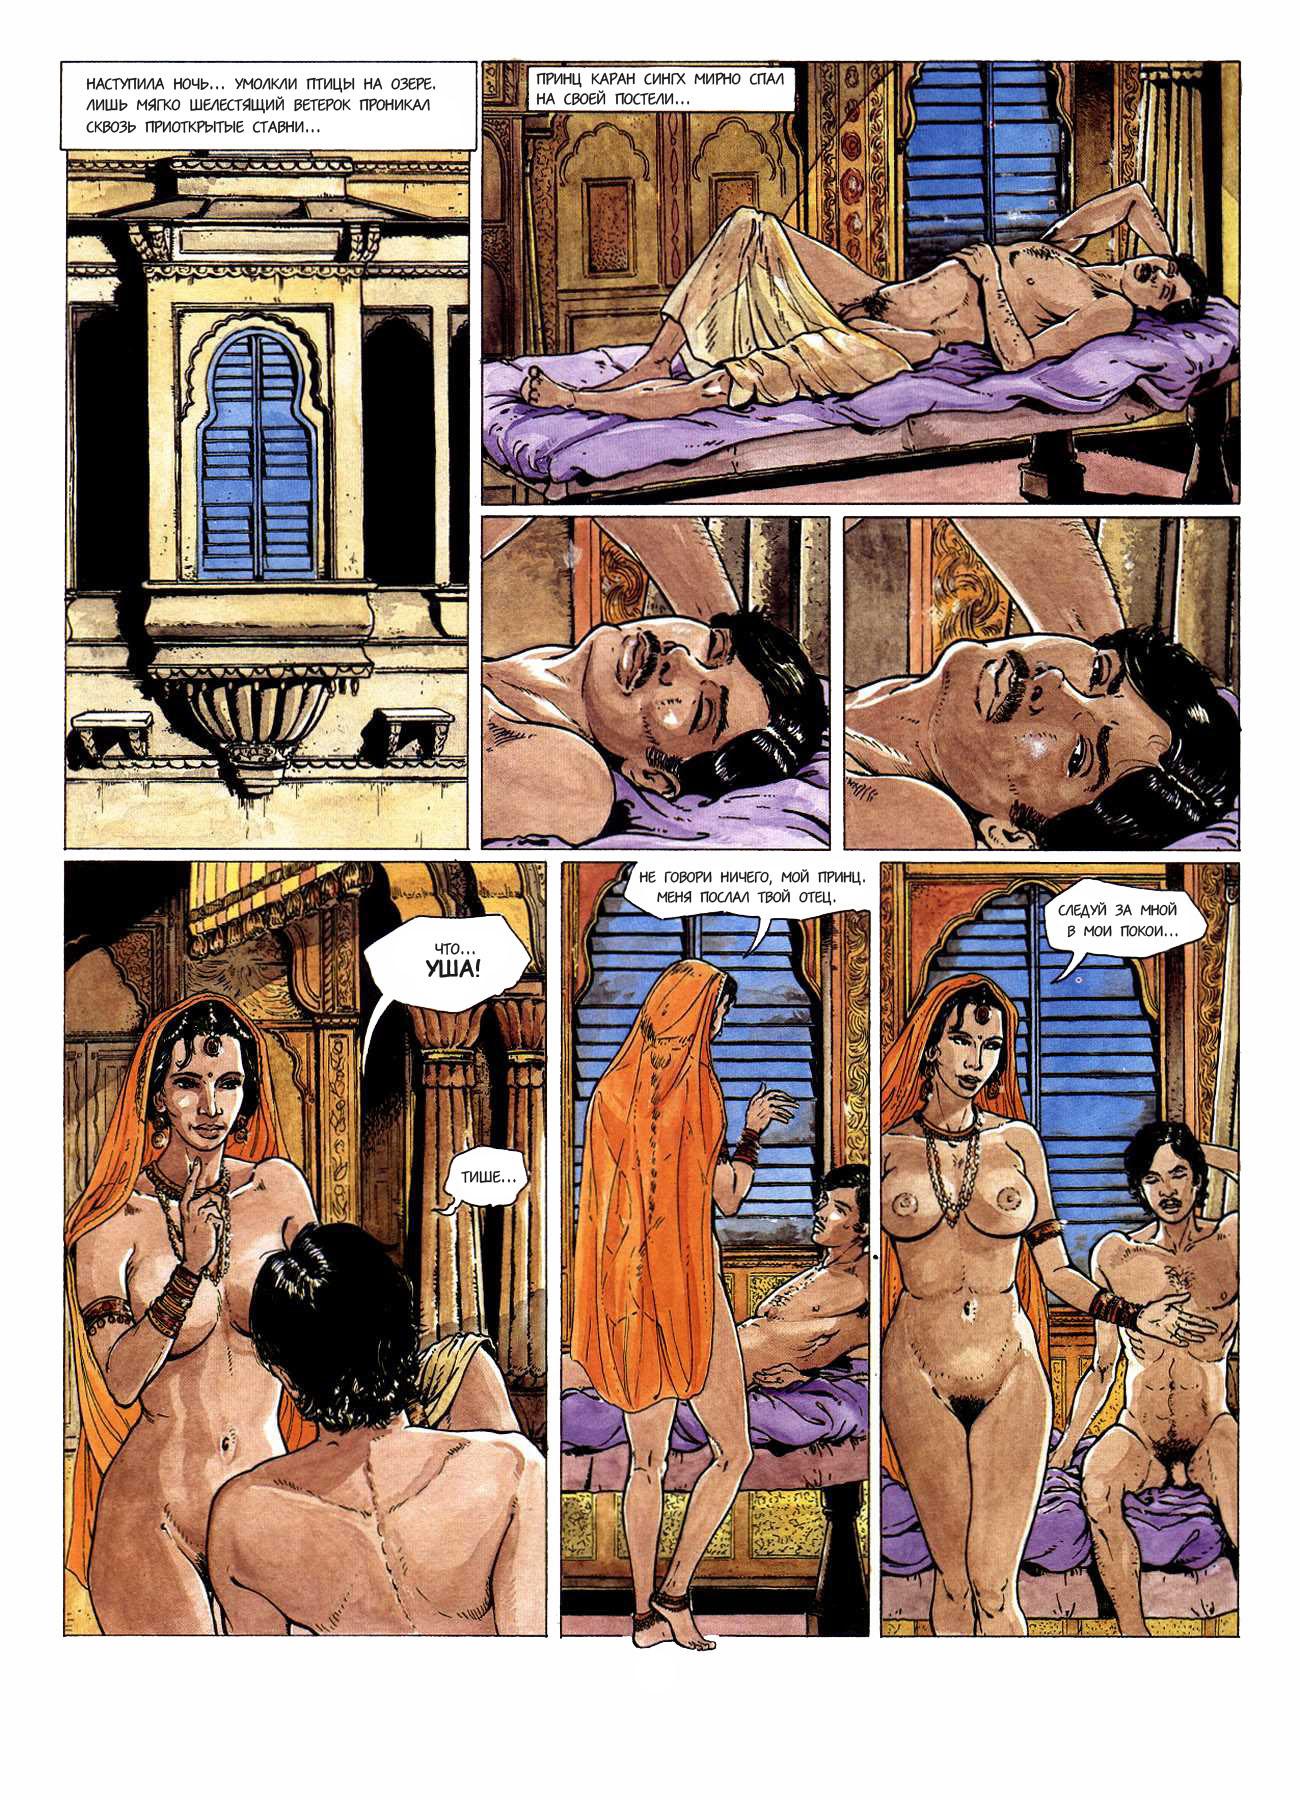 bibliya-pro-seks